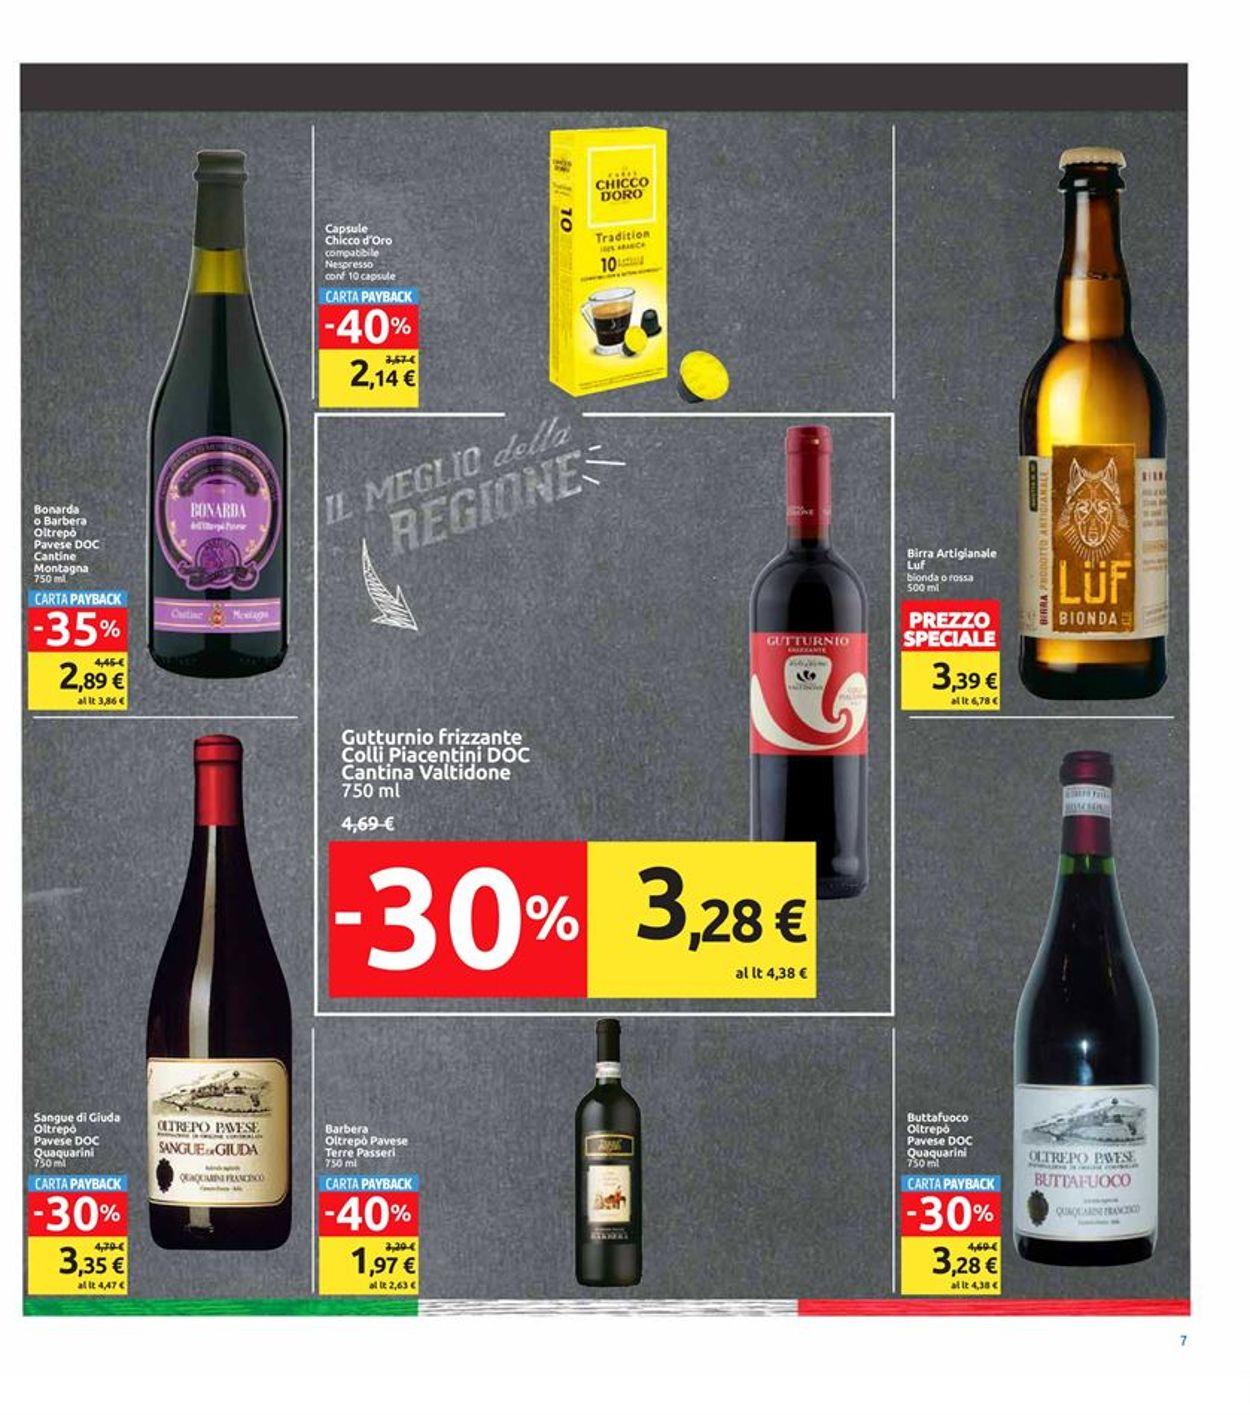 Volantino Carrefour - Offerte 09/08-28/08/2019 (Pagina 7)